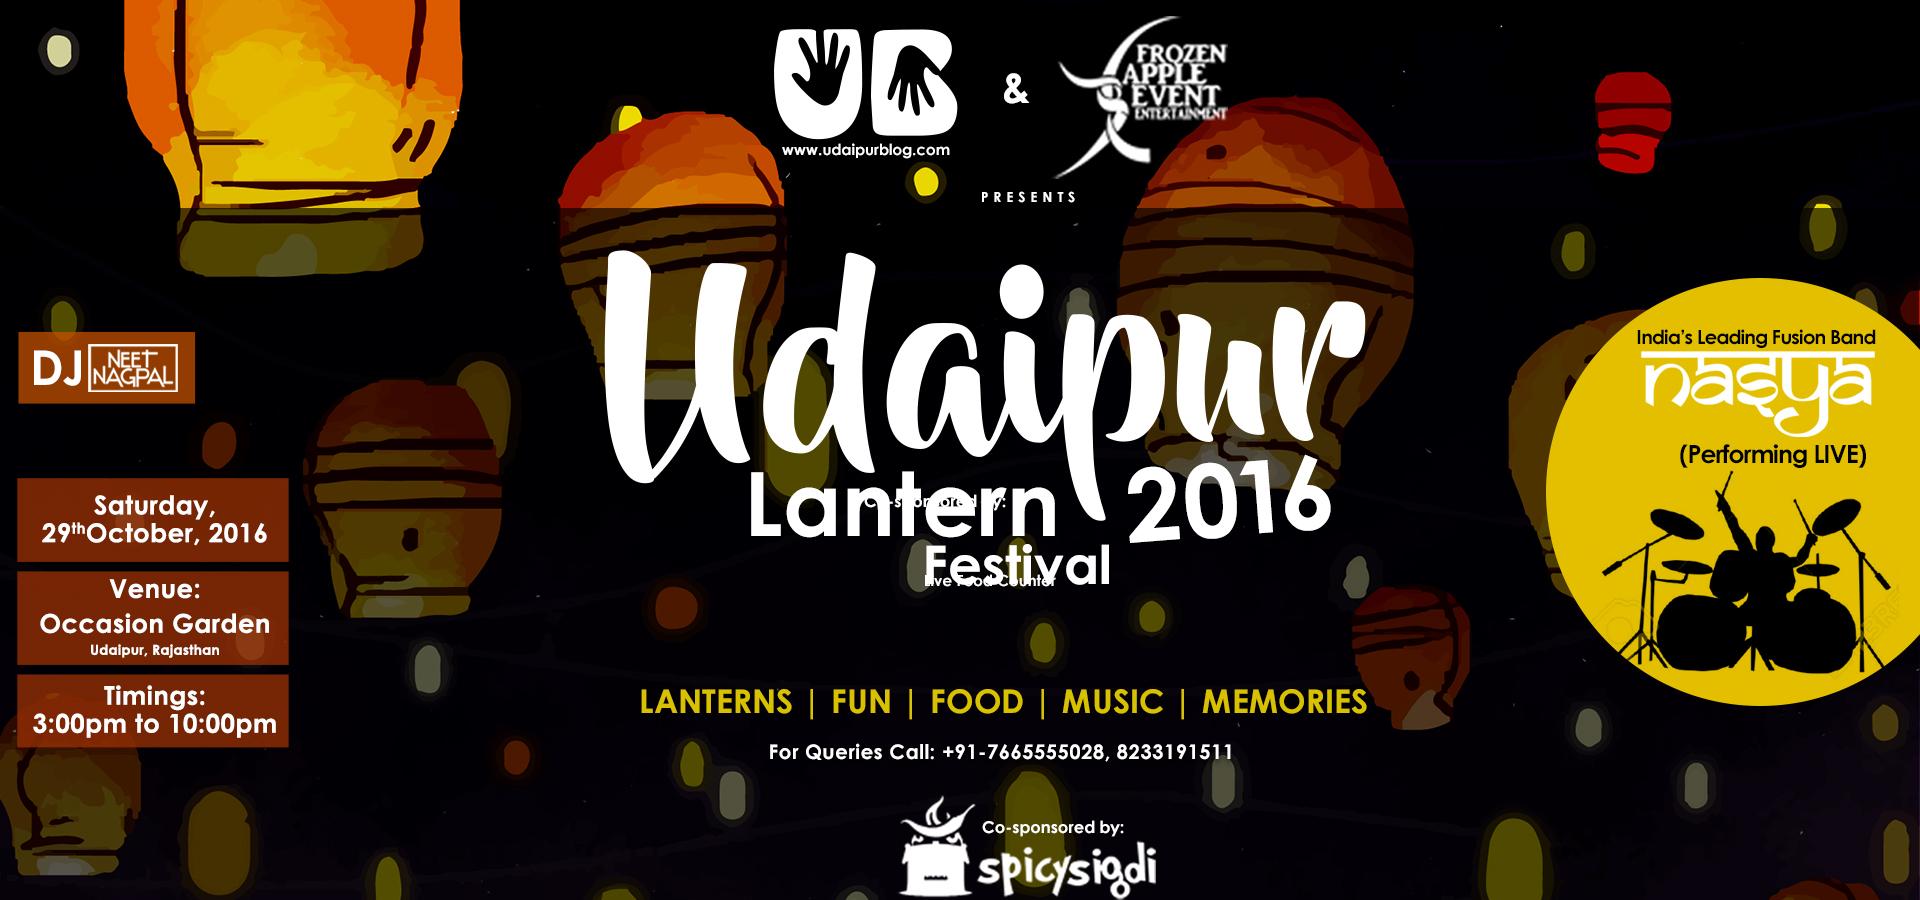 UdaipurBlog invites you for Udaipur Lantern Festival 2016